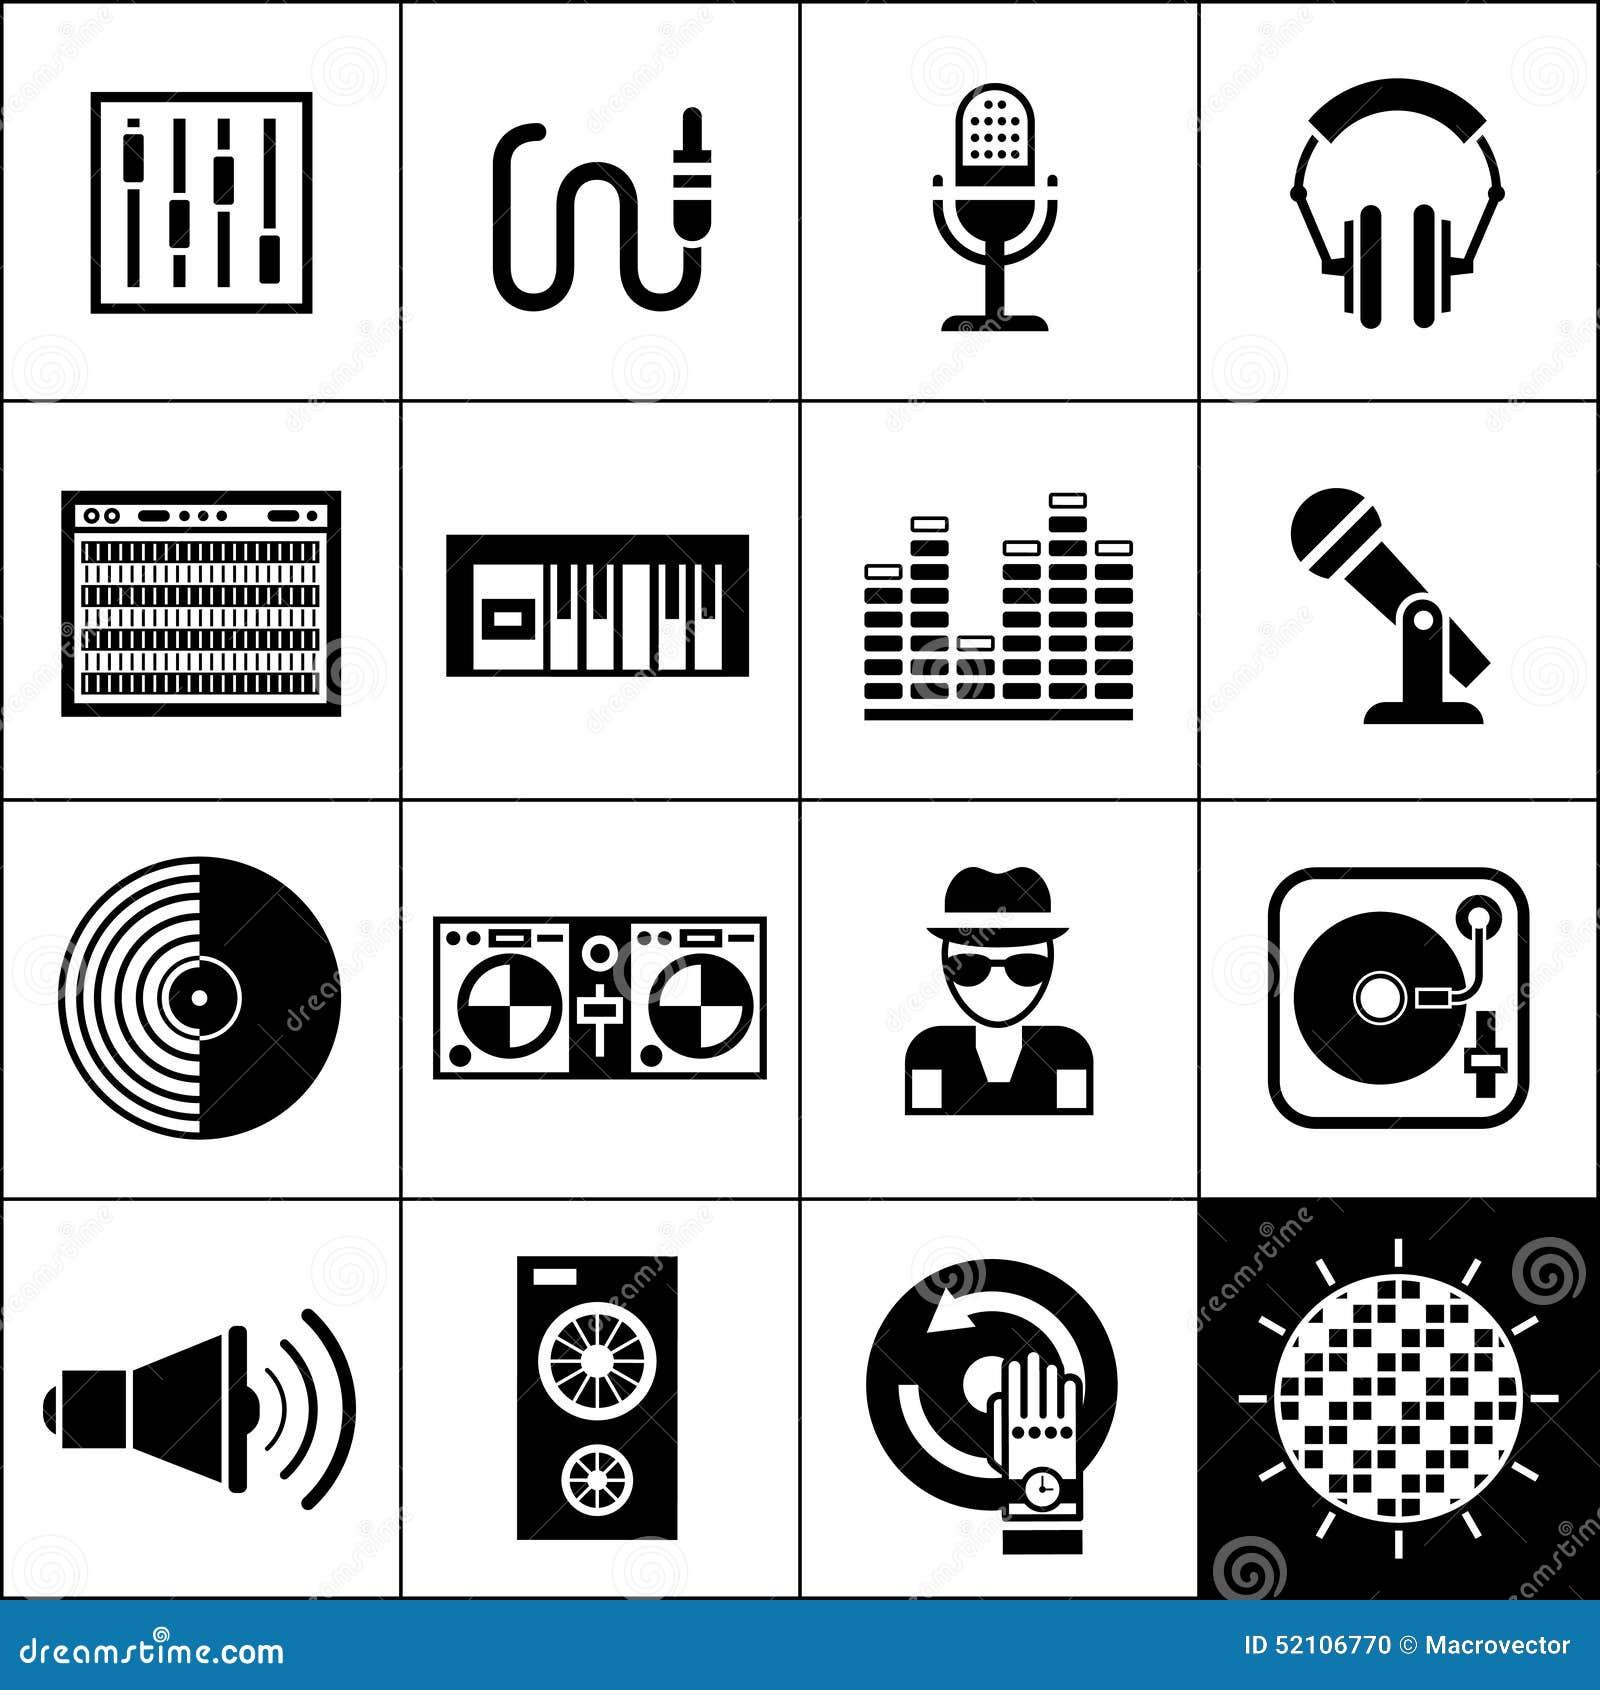 Dj Icons Black Stock Vector Image 52106770